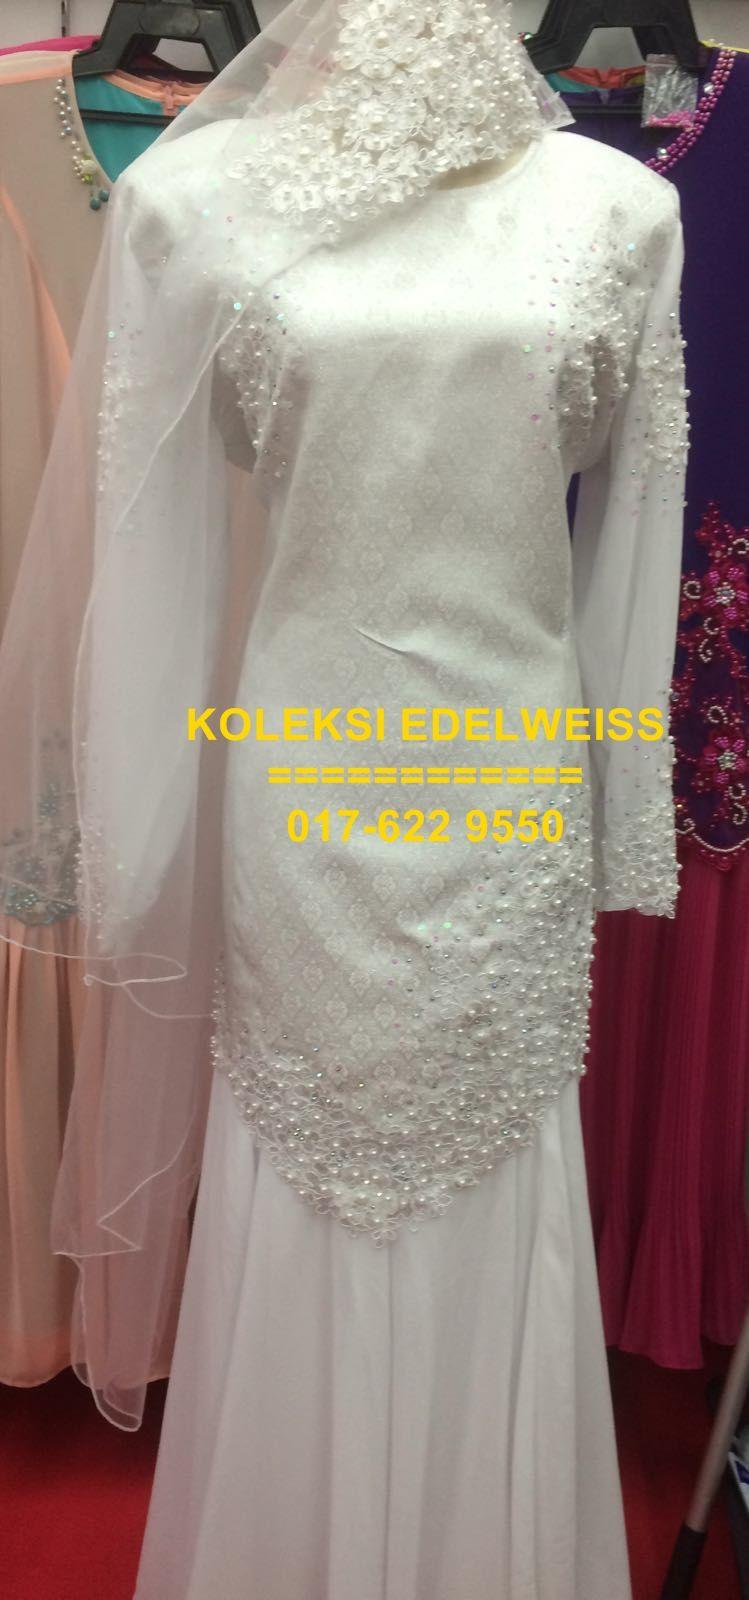 KOLEKSI EDELWEISS Koleksi Baju Pengantin,Tunang,Jubah Muslimah